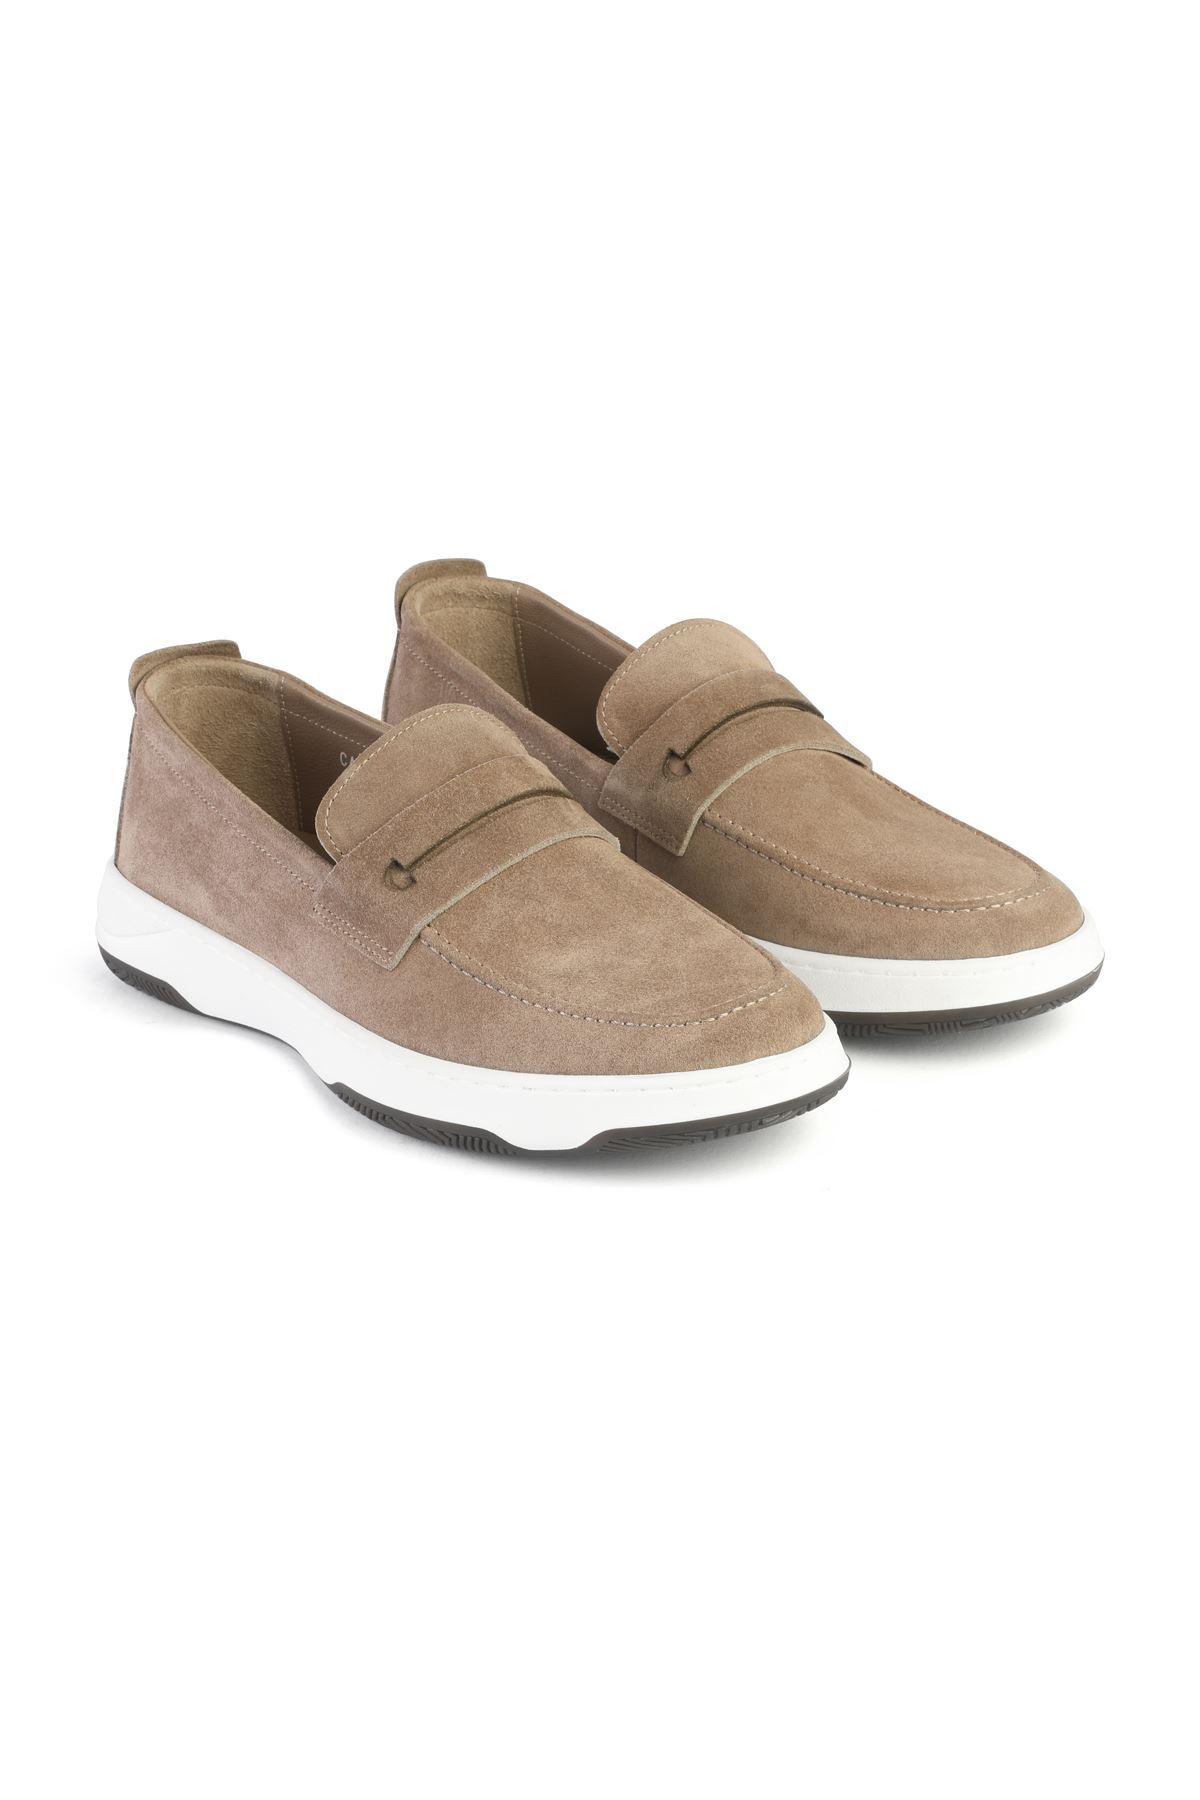 Libero 3229 Mink Loafer Shoes